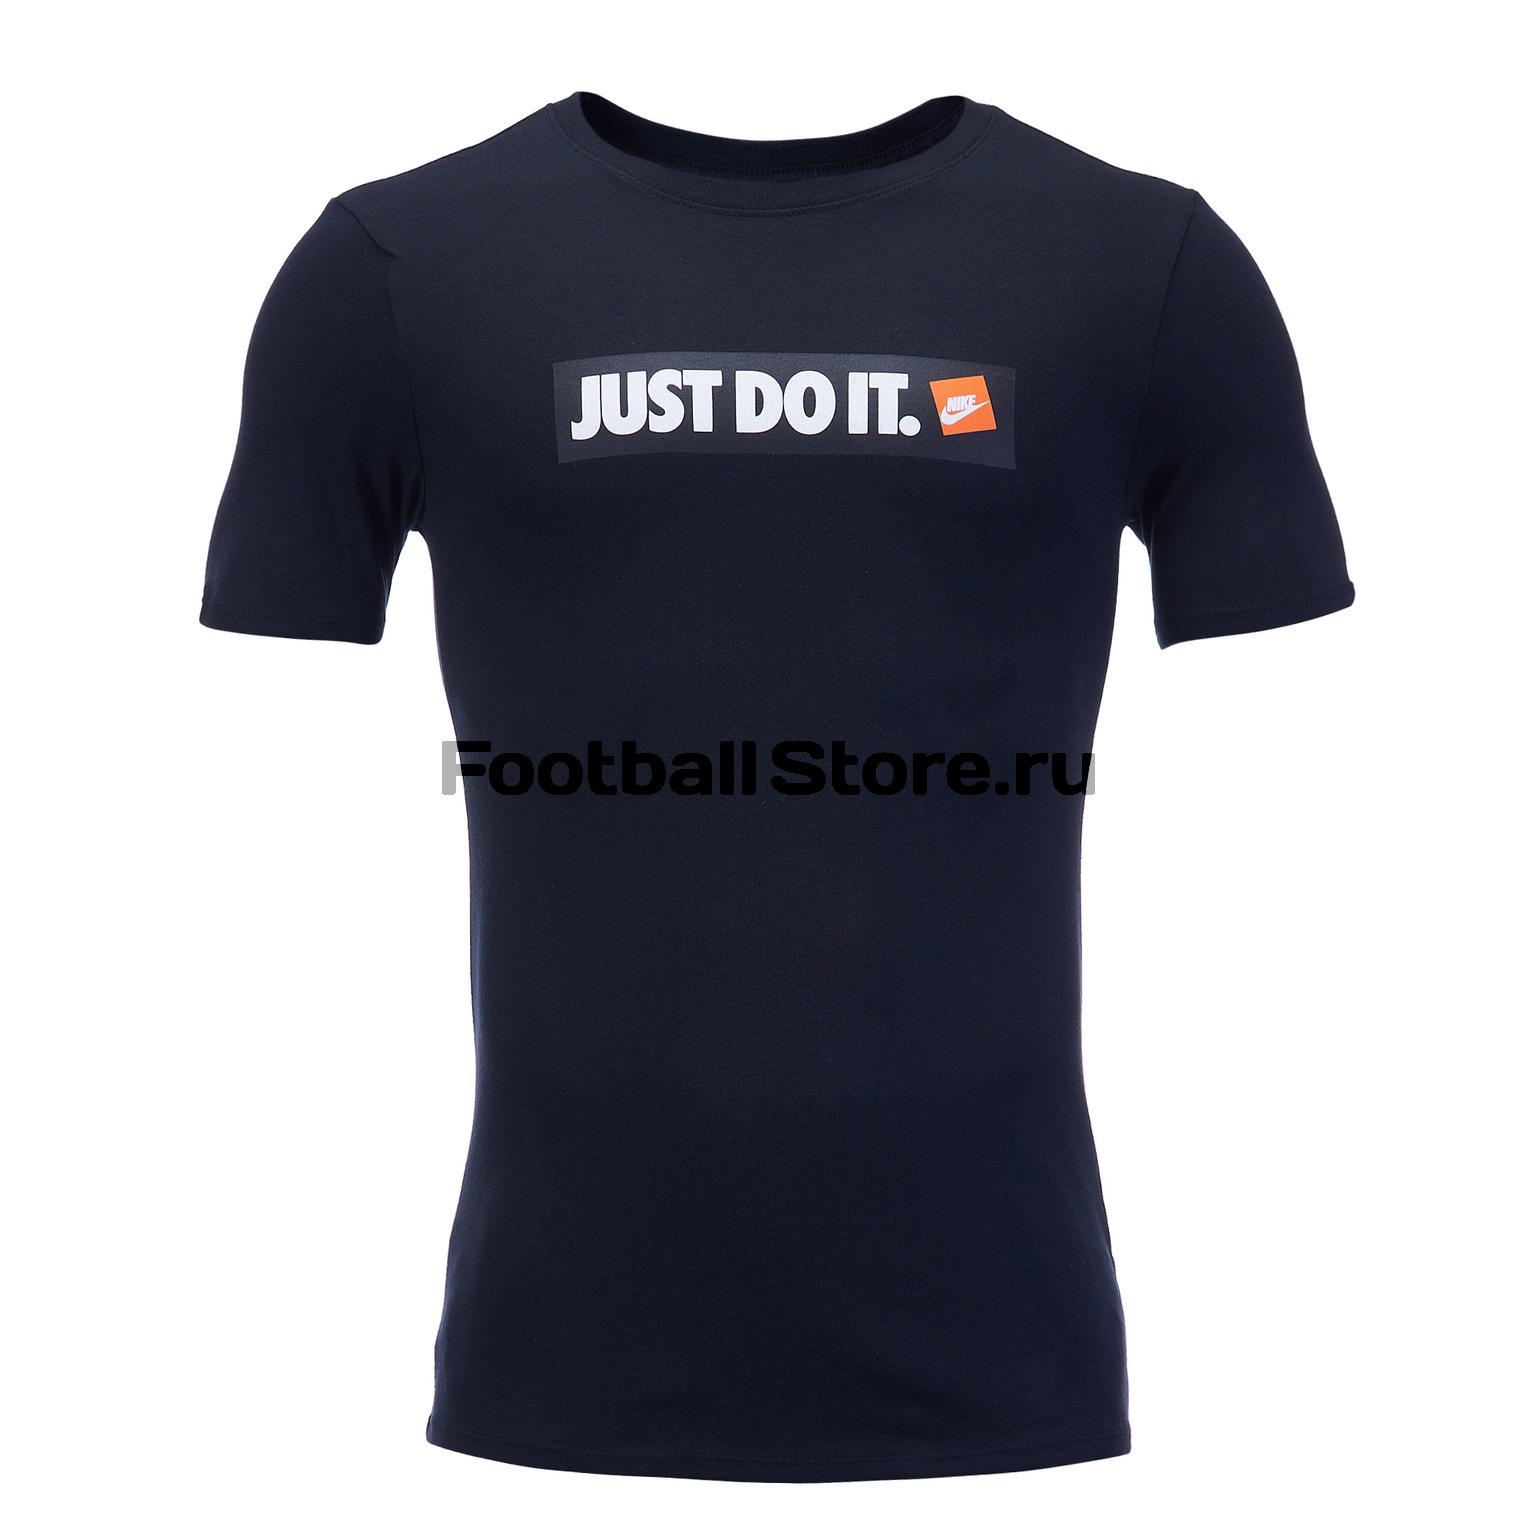 d1153f13 Футболка Nike Just Do It Tee AA6412-010 – купить в интернет магазине ...